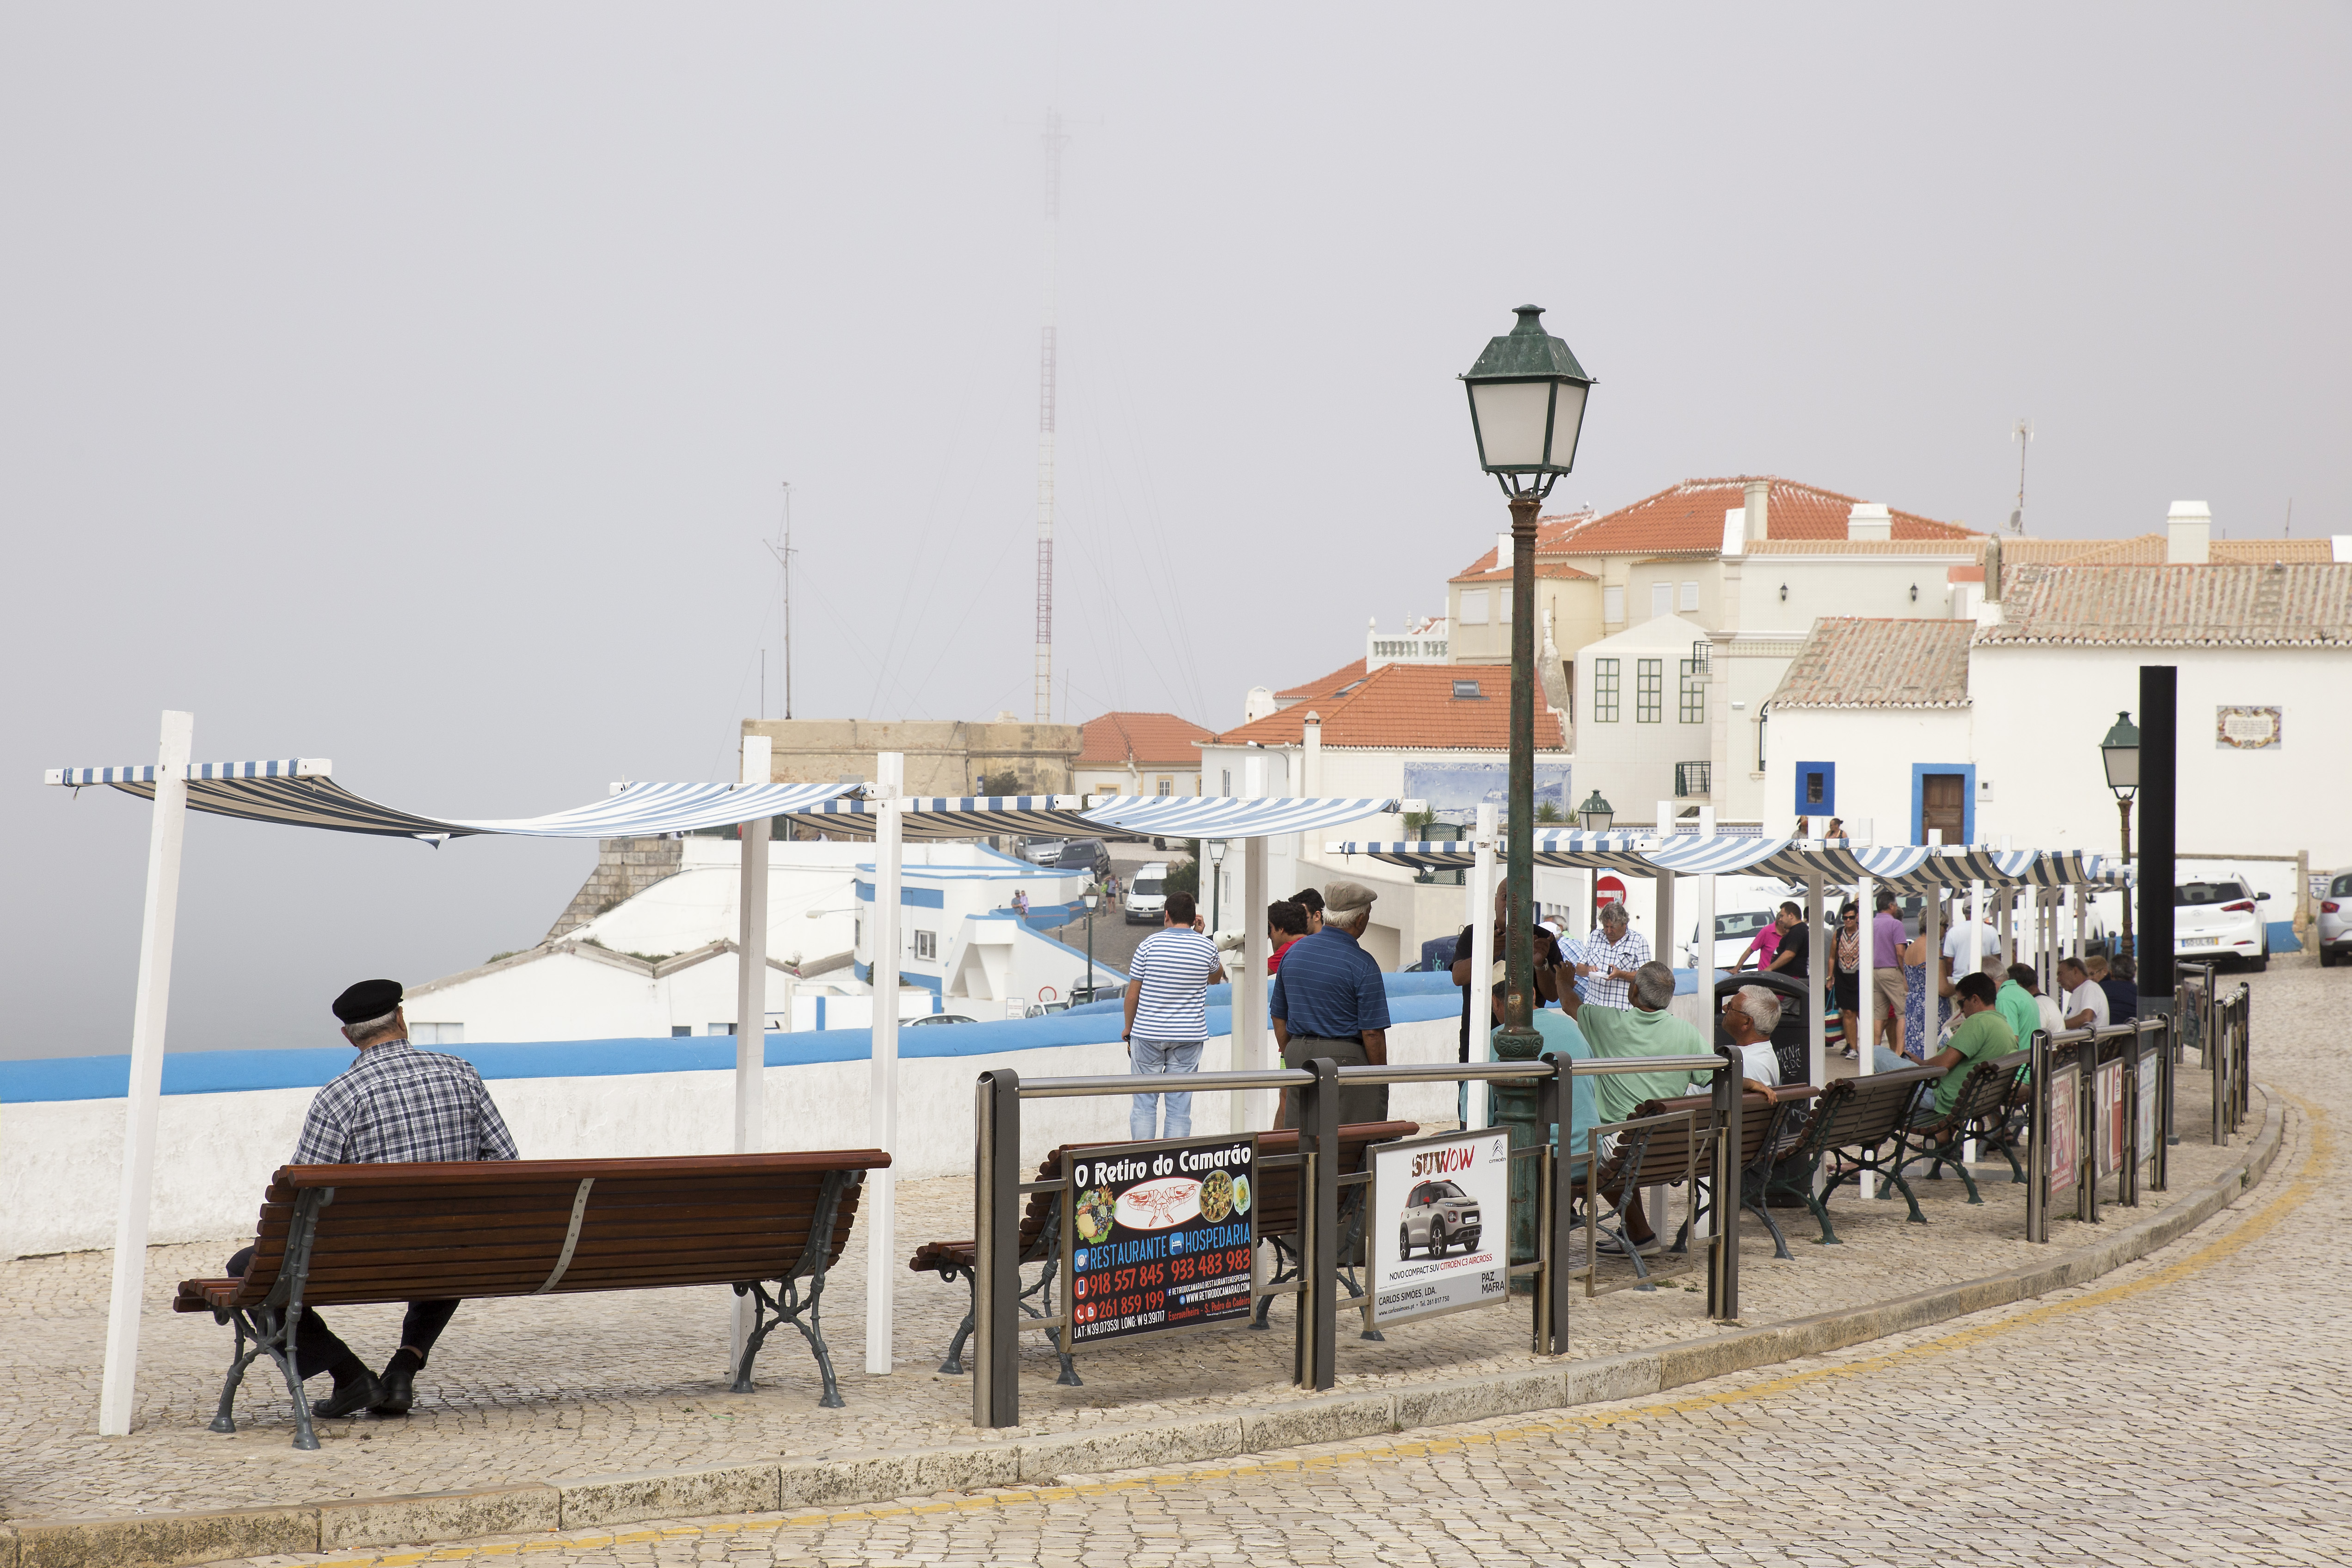 Ericeira, Portugal (2018)